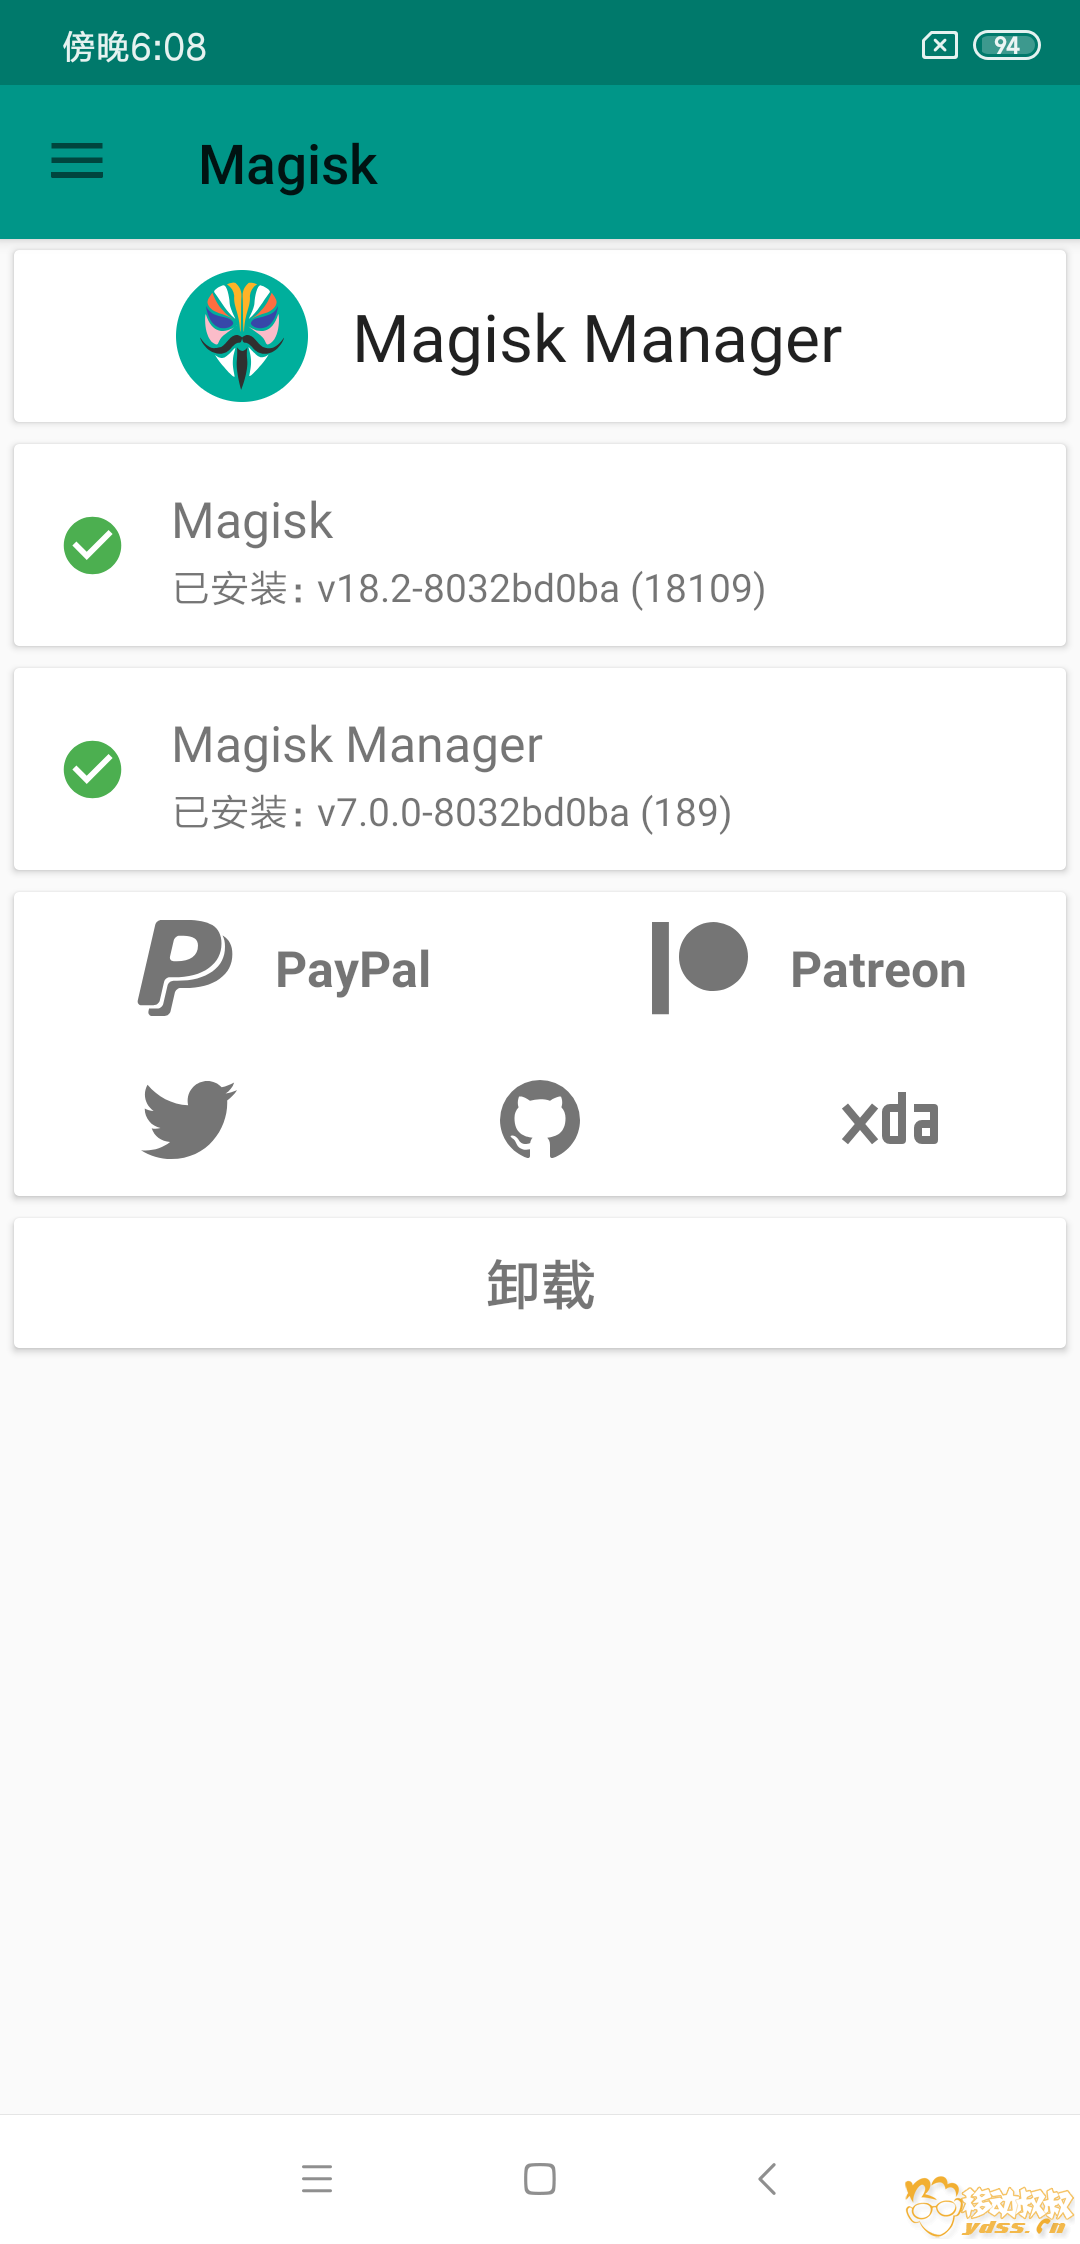 Screenshot_2019-04-12-18-08-18-737_com.topjohnwu.magisk.png